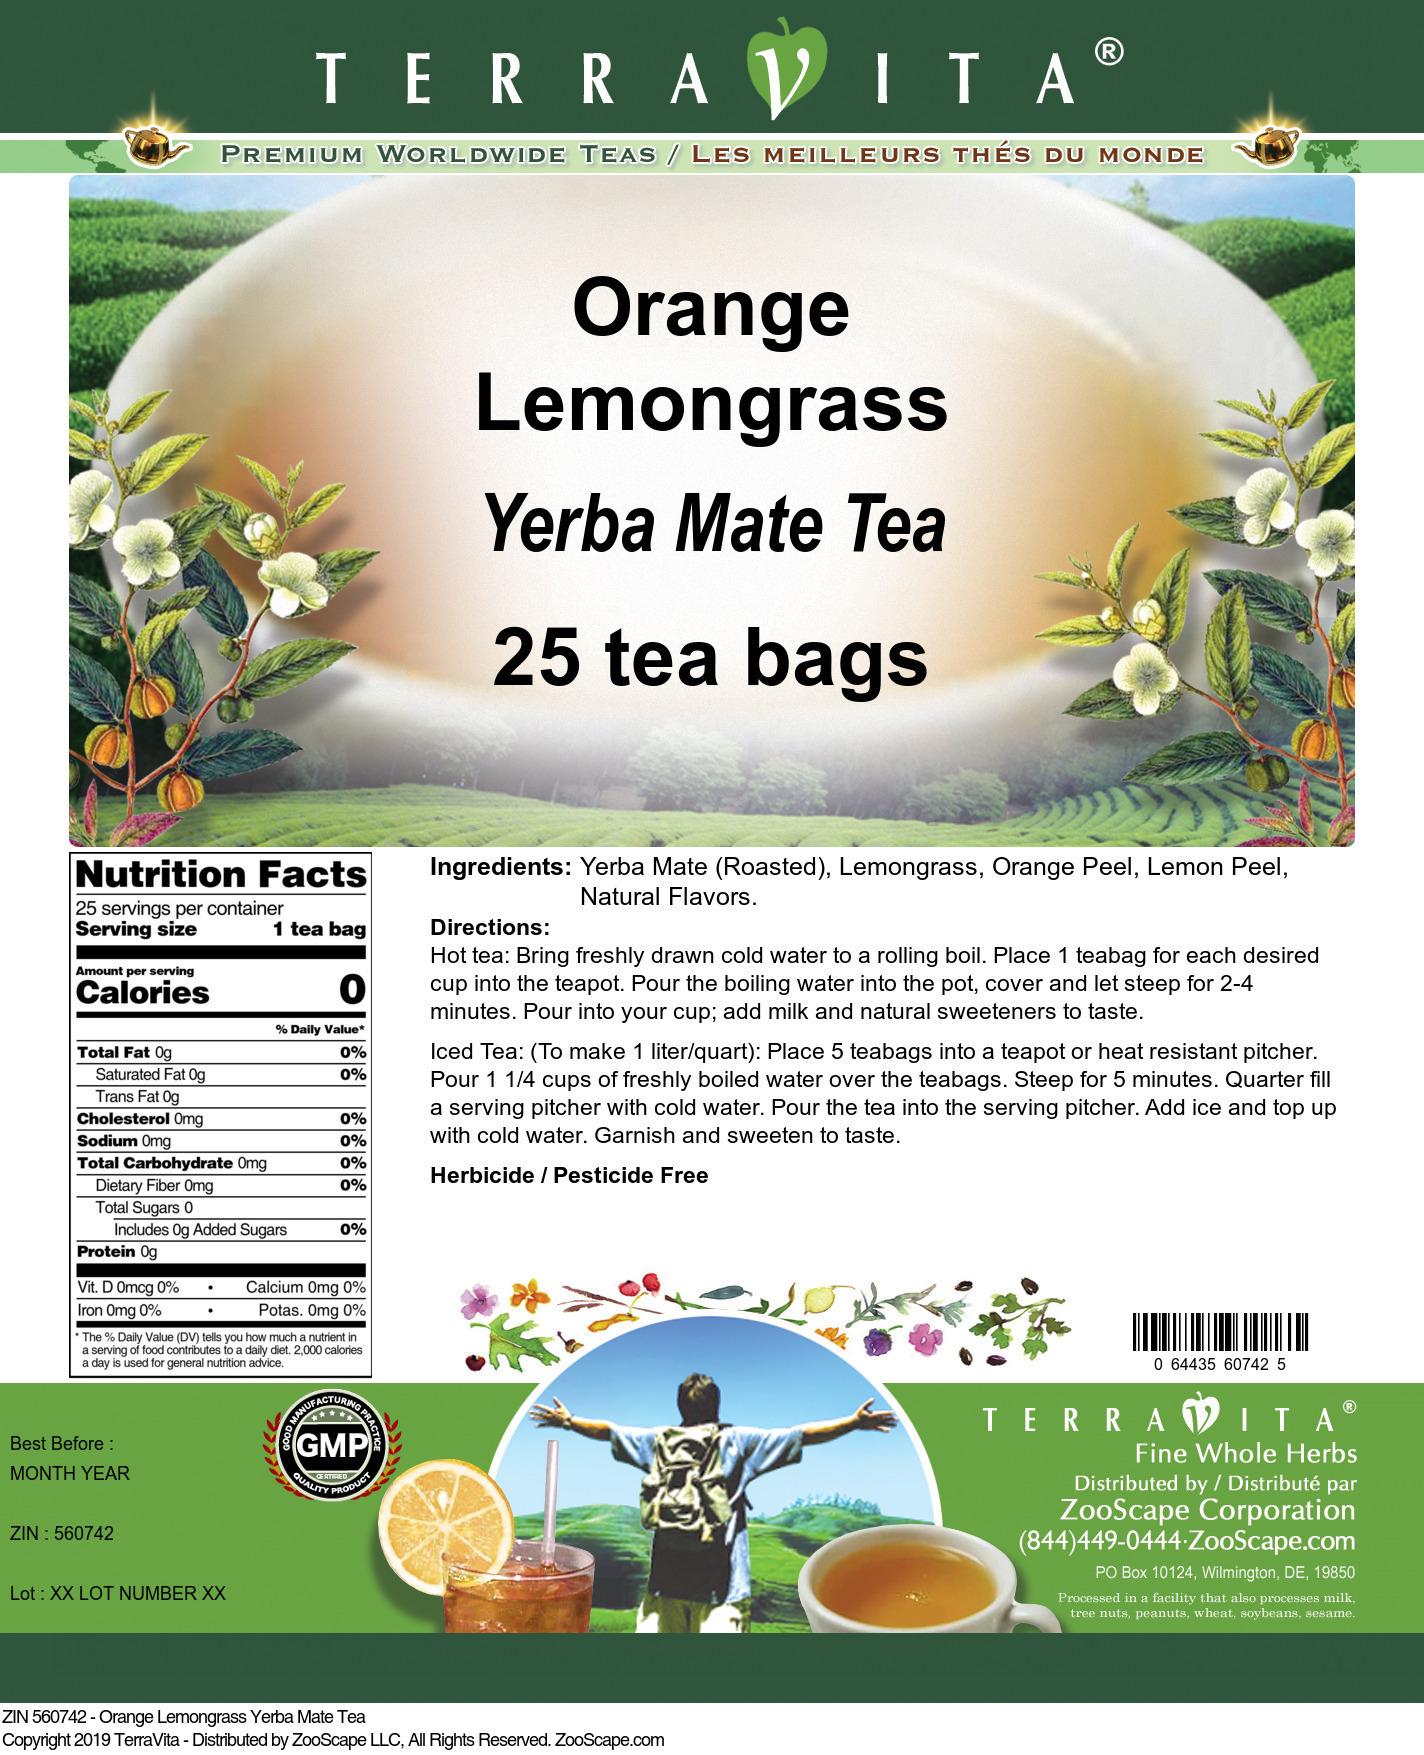 Orange Lemongrass Yerba Mate Tea